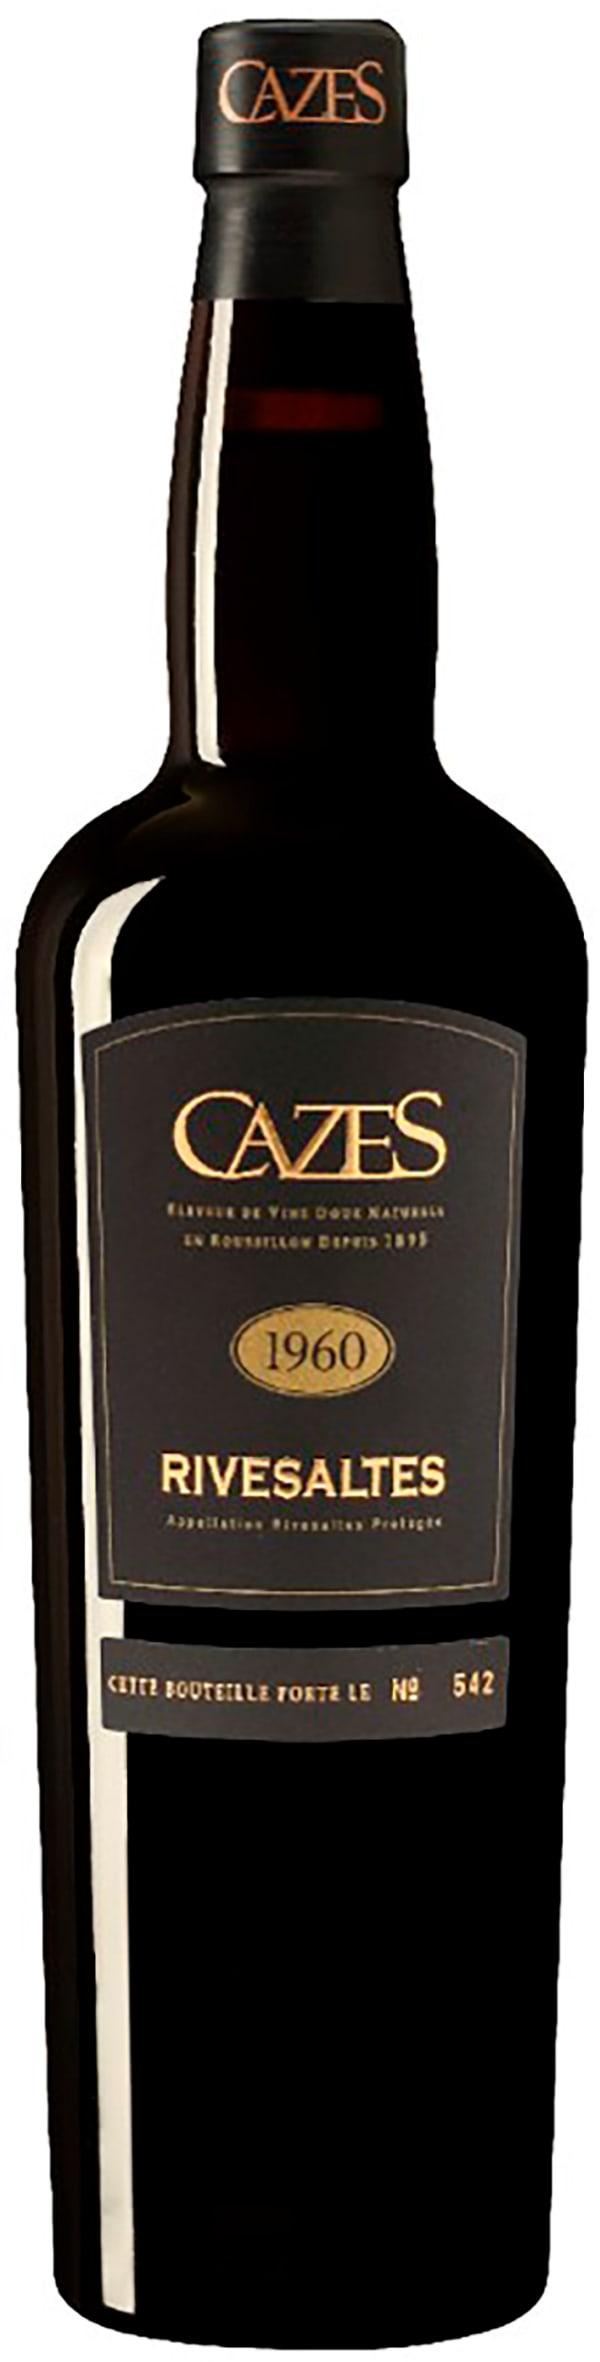 Cazes Rivesaltes 1960